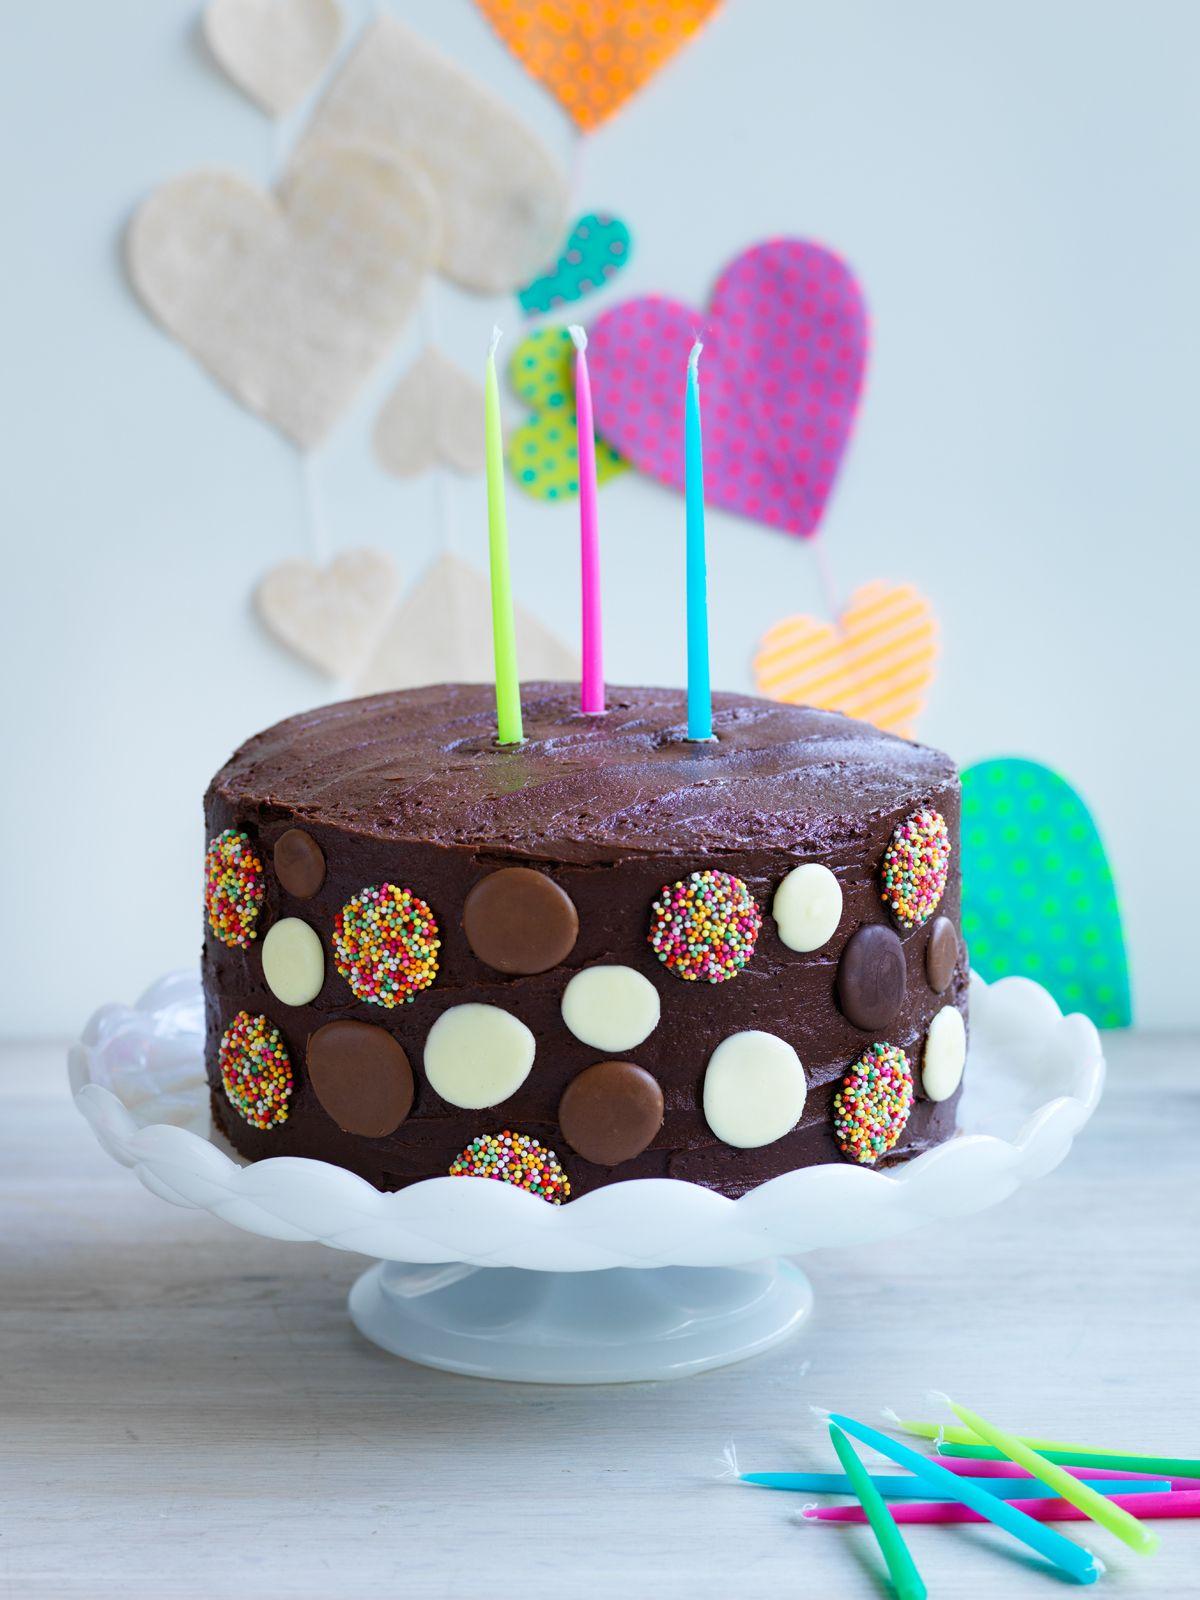 Recipes Polka Dot Cake Louise Fulton Keats Kids Party Food